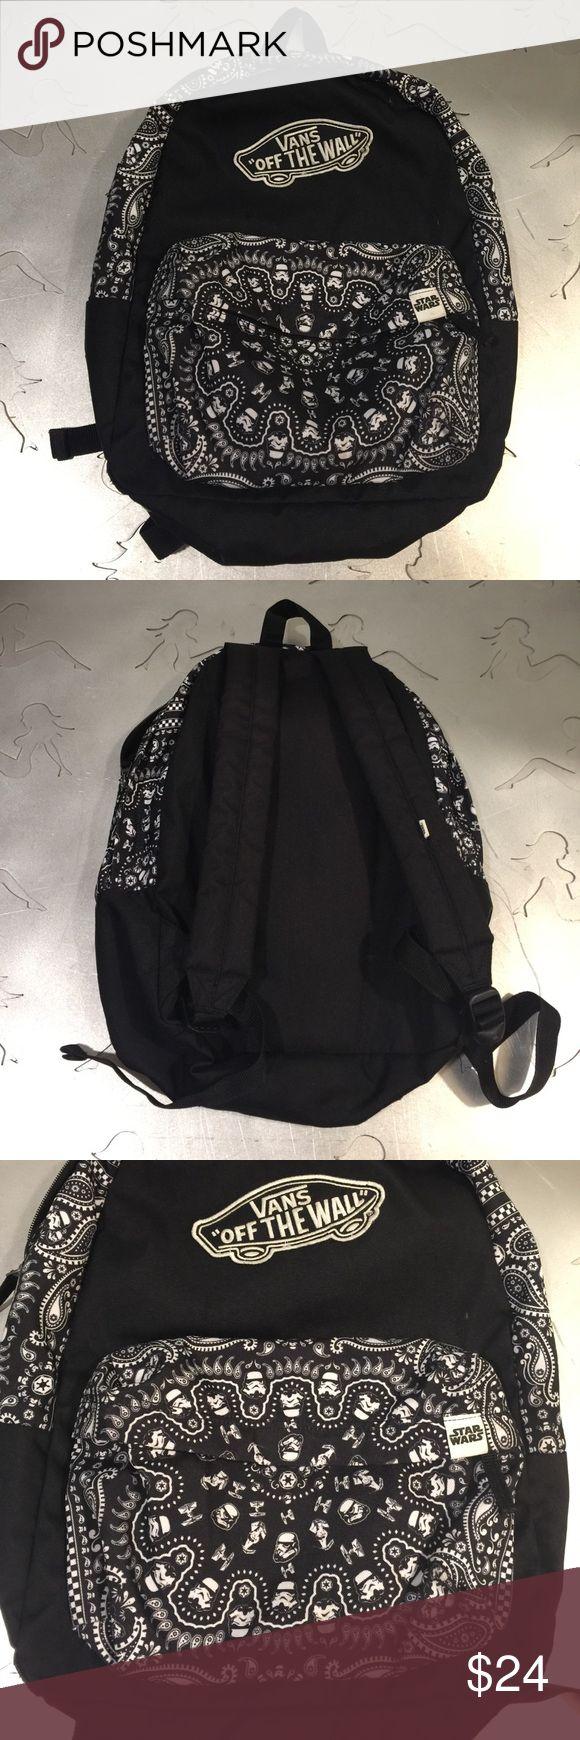 VANS BACKPACK STAR WARS COLLABORATION. Black vans backpack in good condition. Star Wars print. Vans Bags Backpacks